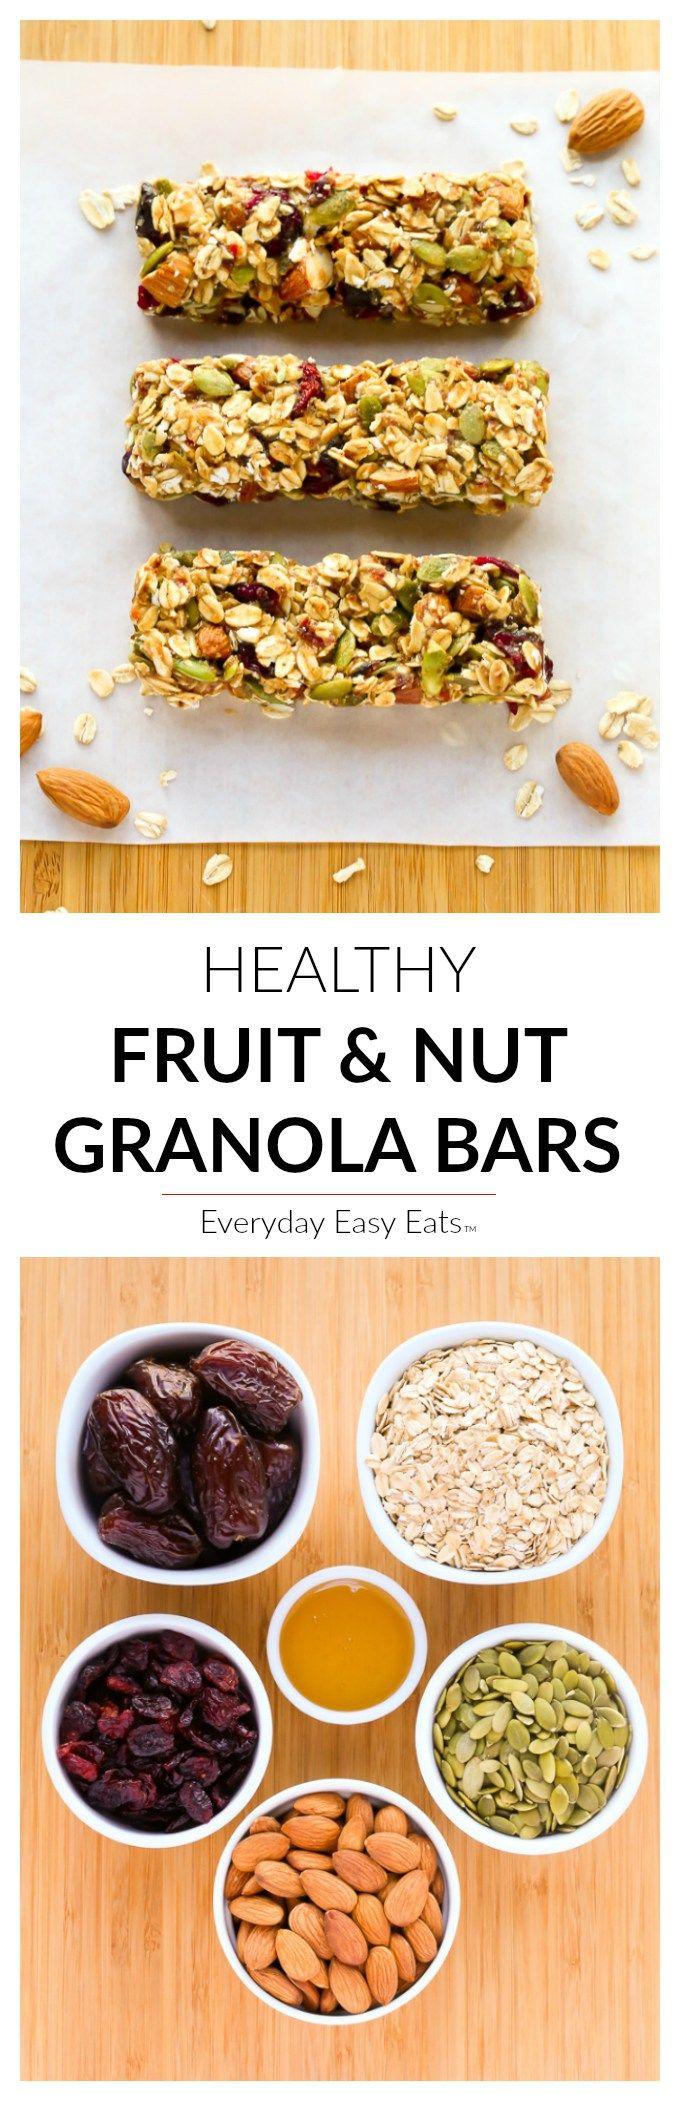 No Bake 6 Ingredient Healthy Fruit Nut Granola Bars Everydayeasyeats Com Healthy Granola Bars Healthy Fruits Granola Healthy